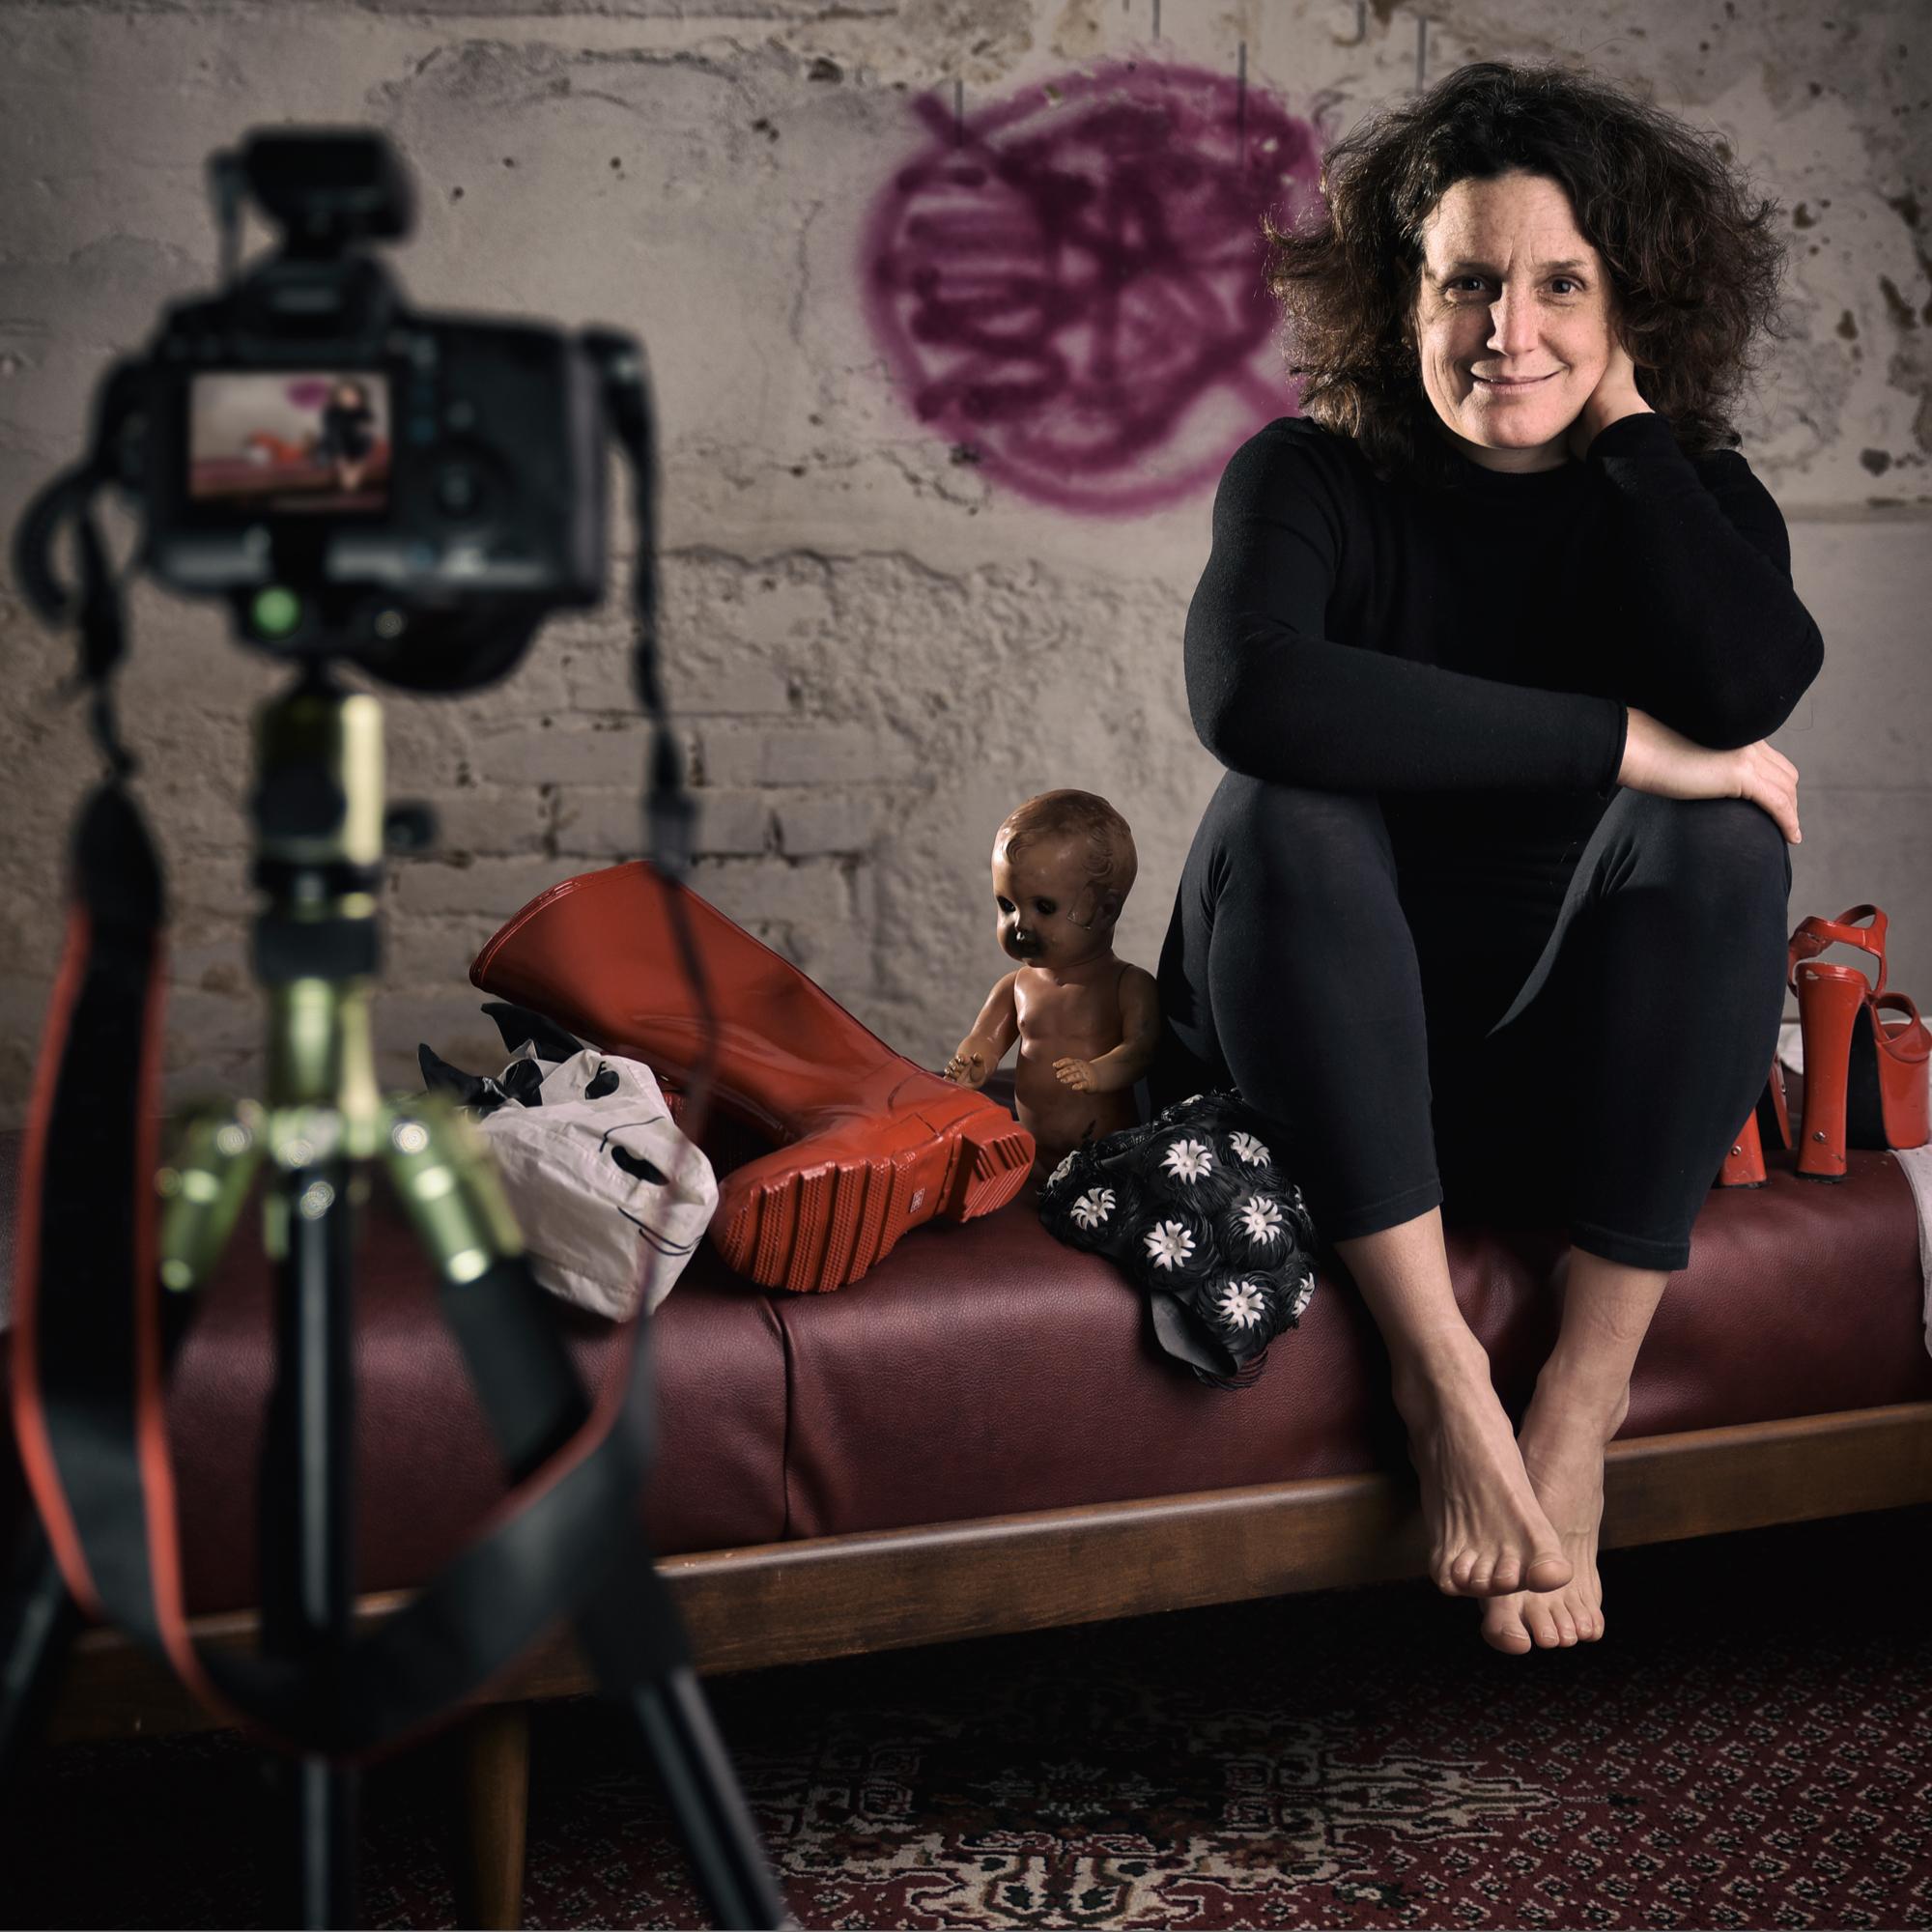 Profilbild Katja Gehrung.jpg